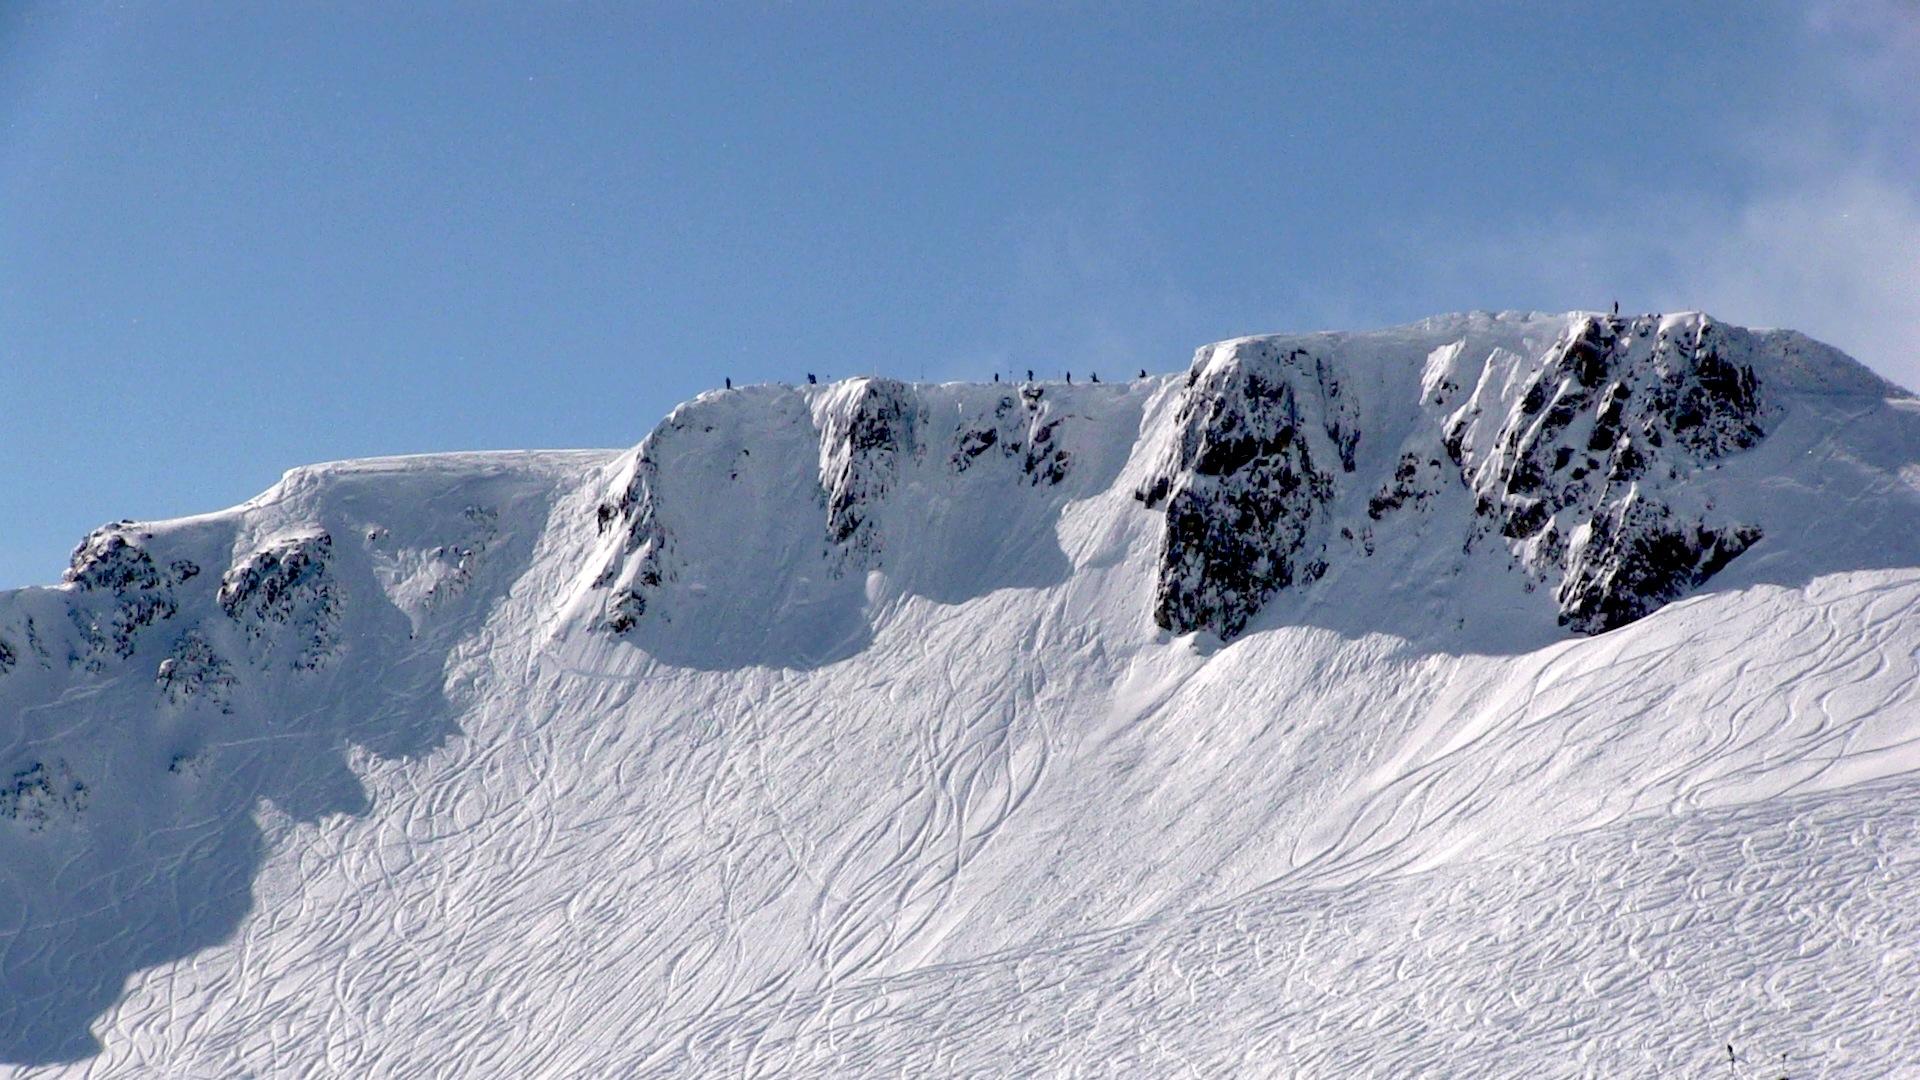 The Worlds 100 Best Ski Runs